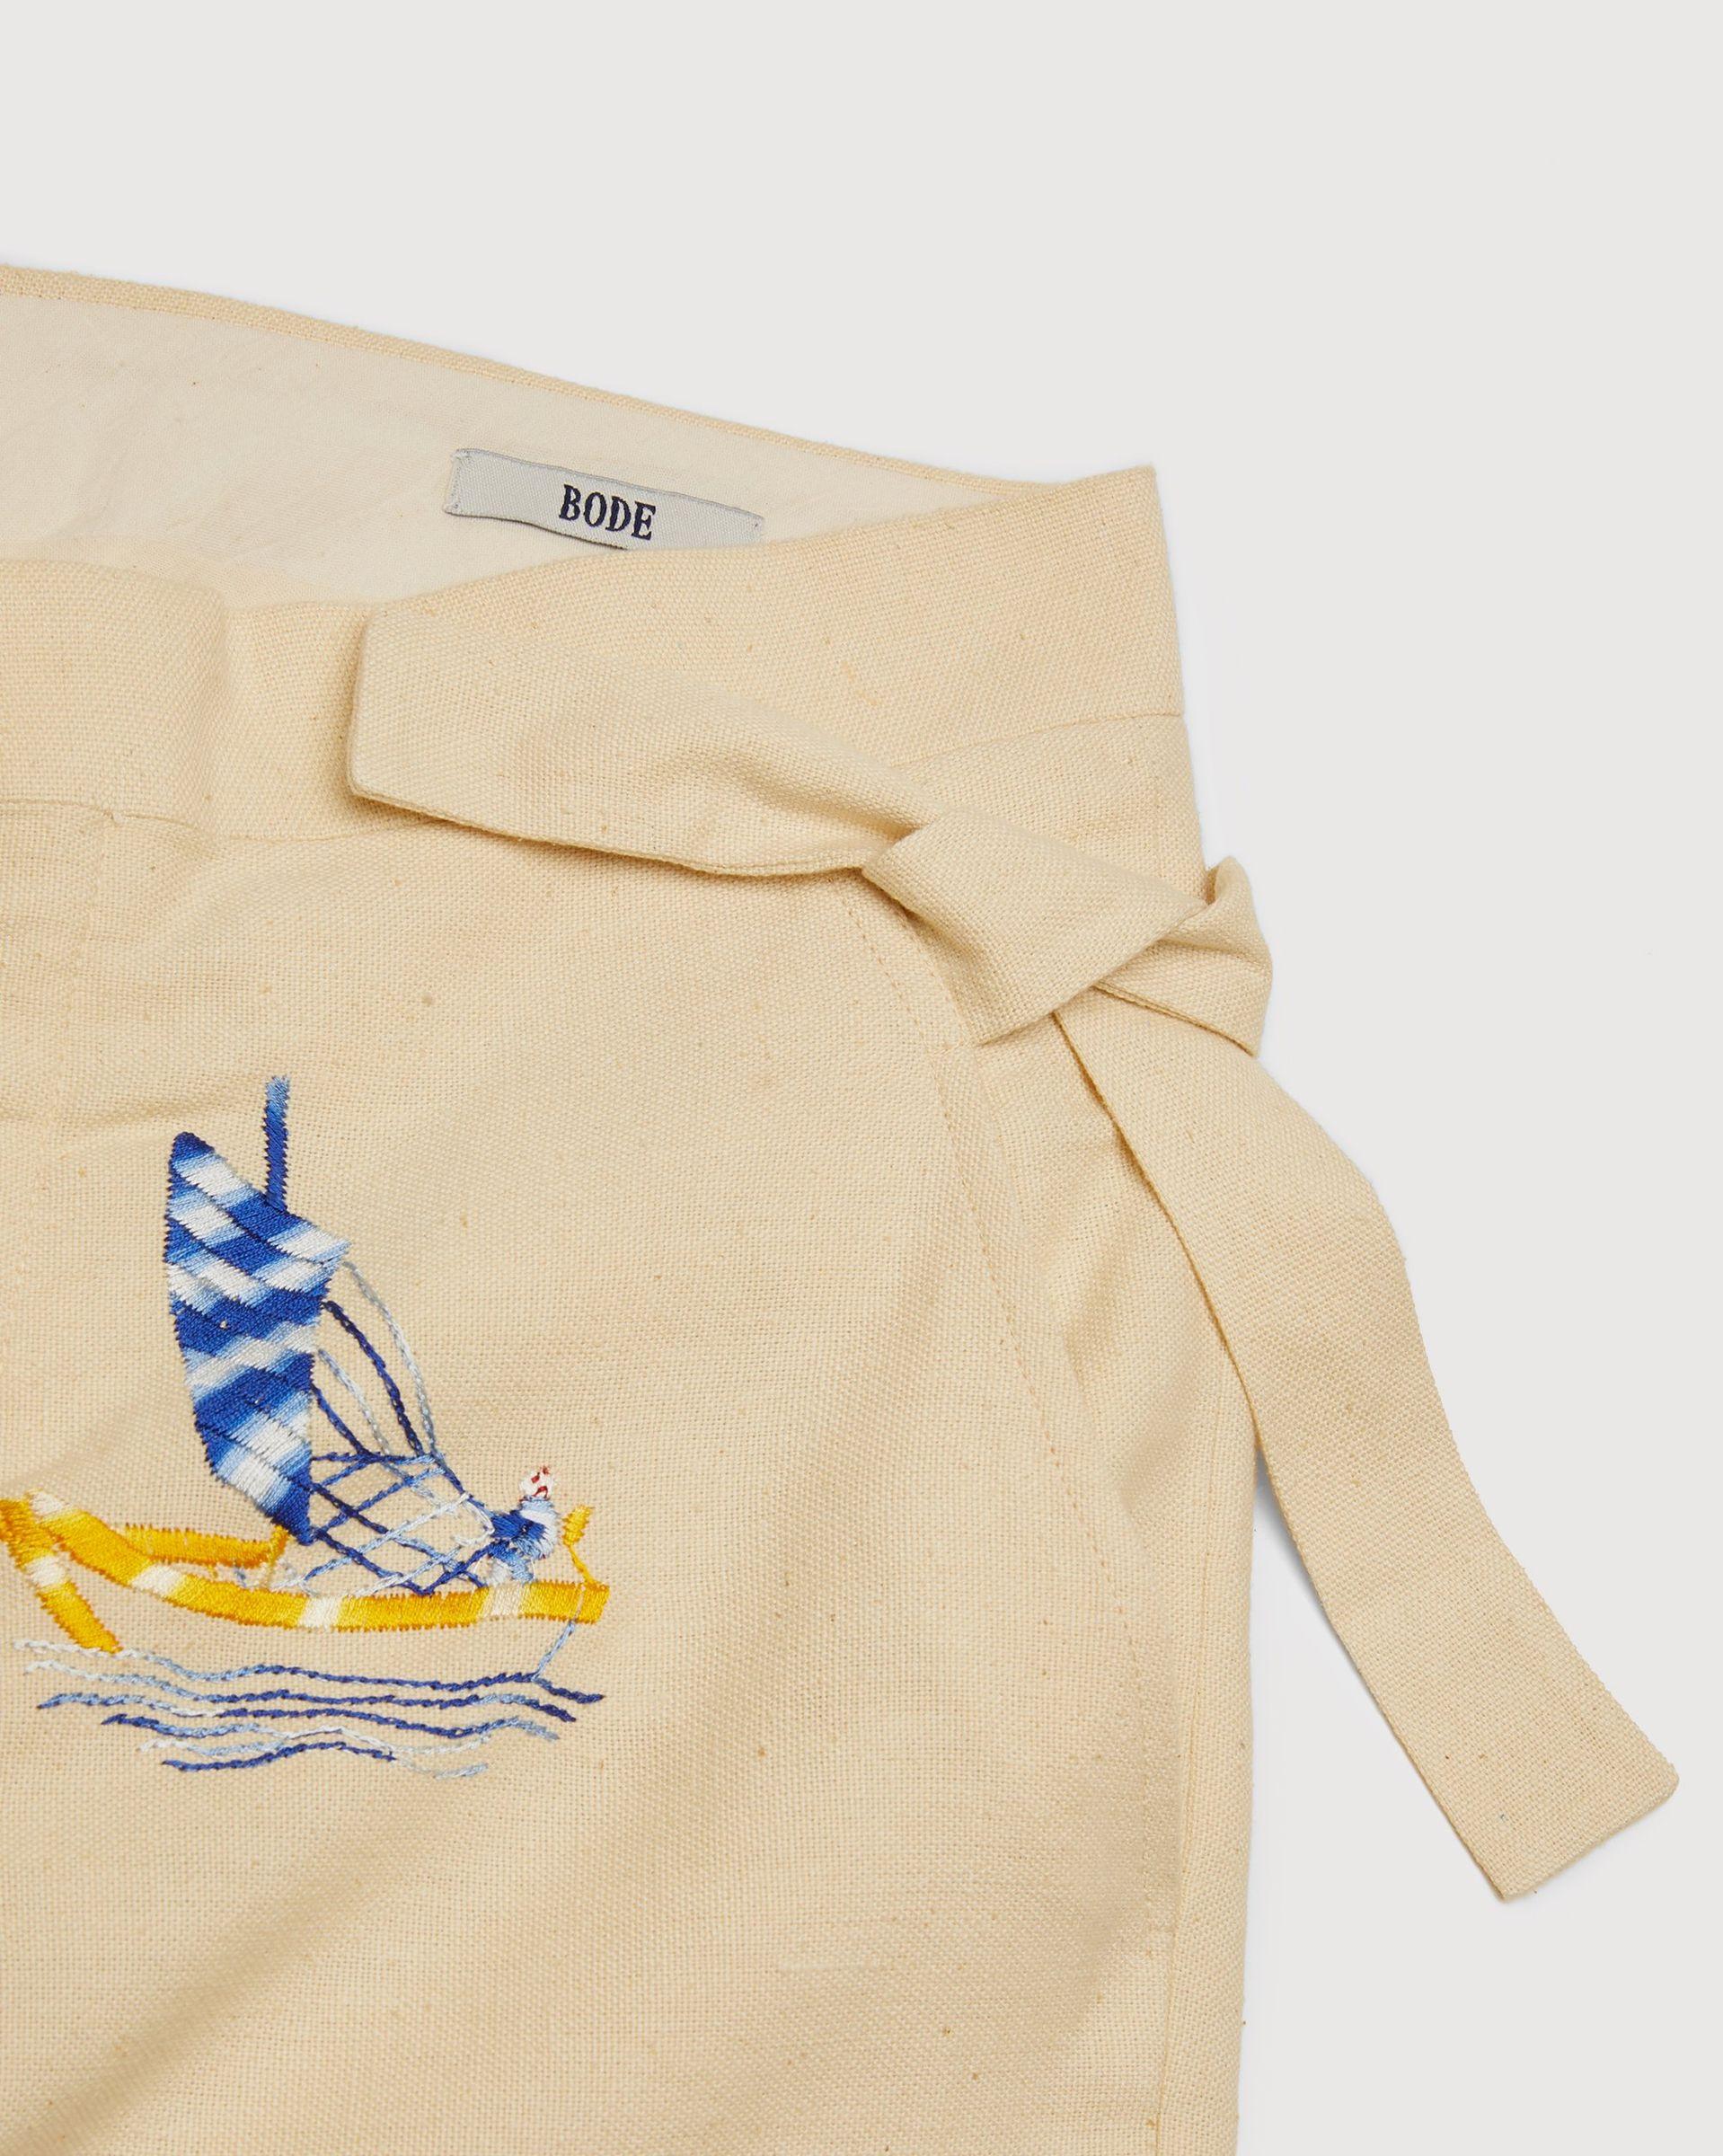 BODE - Sailing Tableau Trousers Tan - Image 4